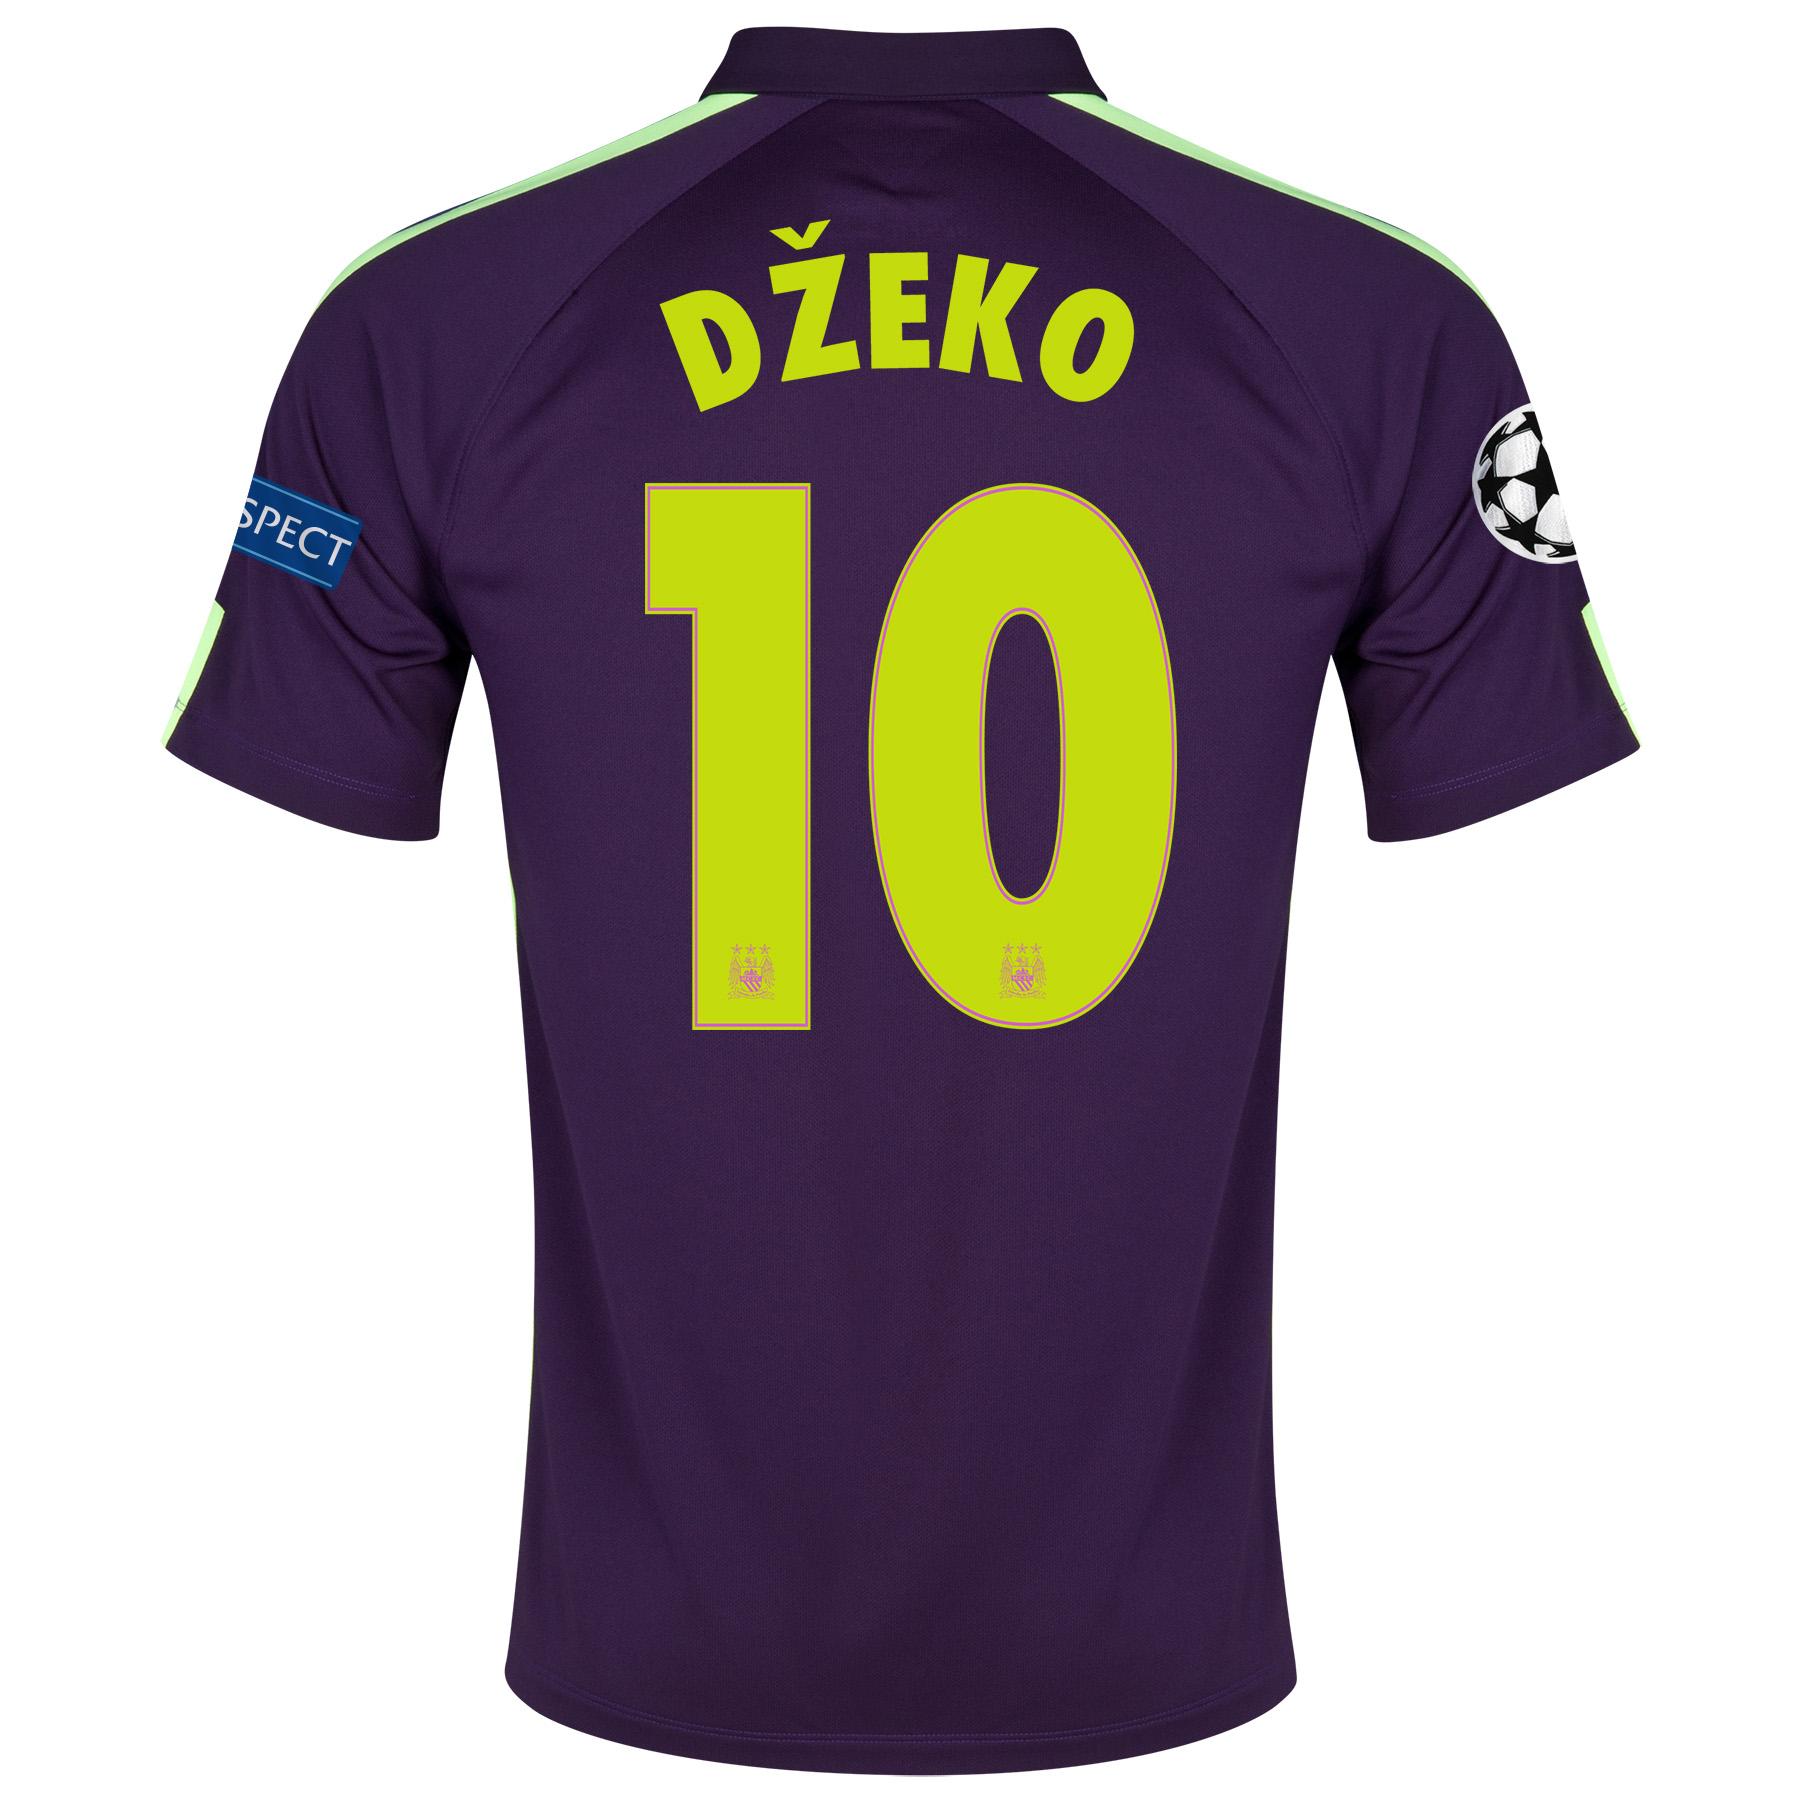 Manchester City UEFA Champions League Cup Away Shirt 2014/15 Purple with Dzeko 10 printing